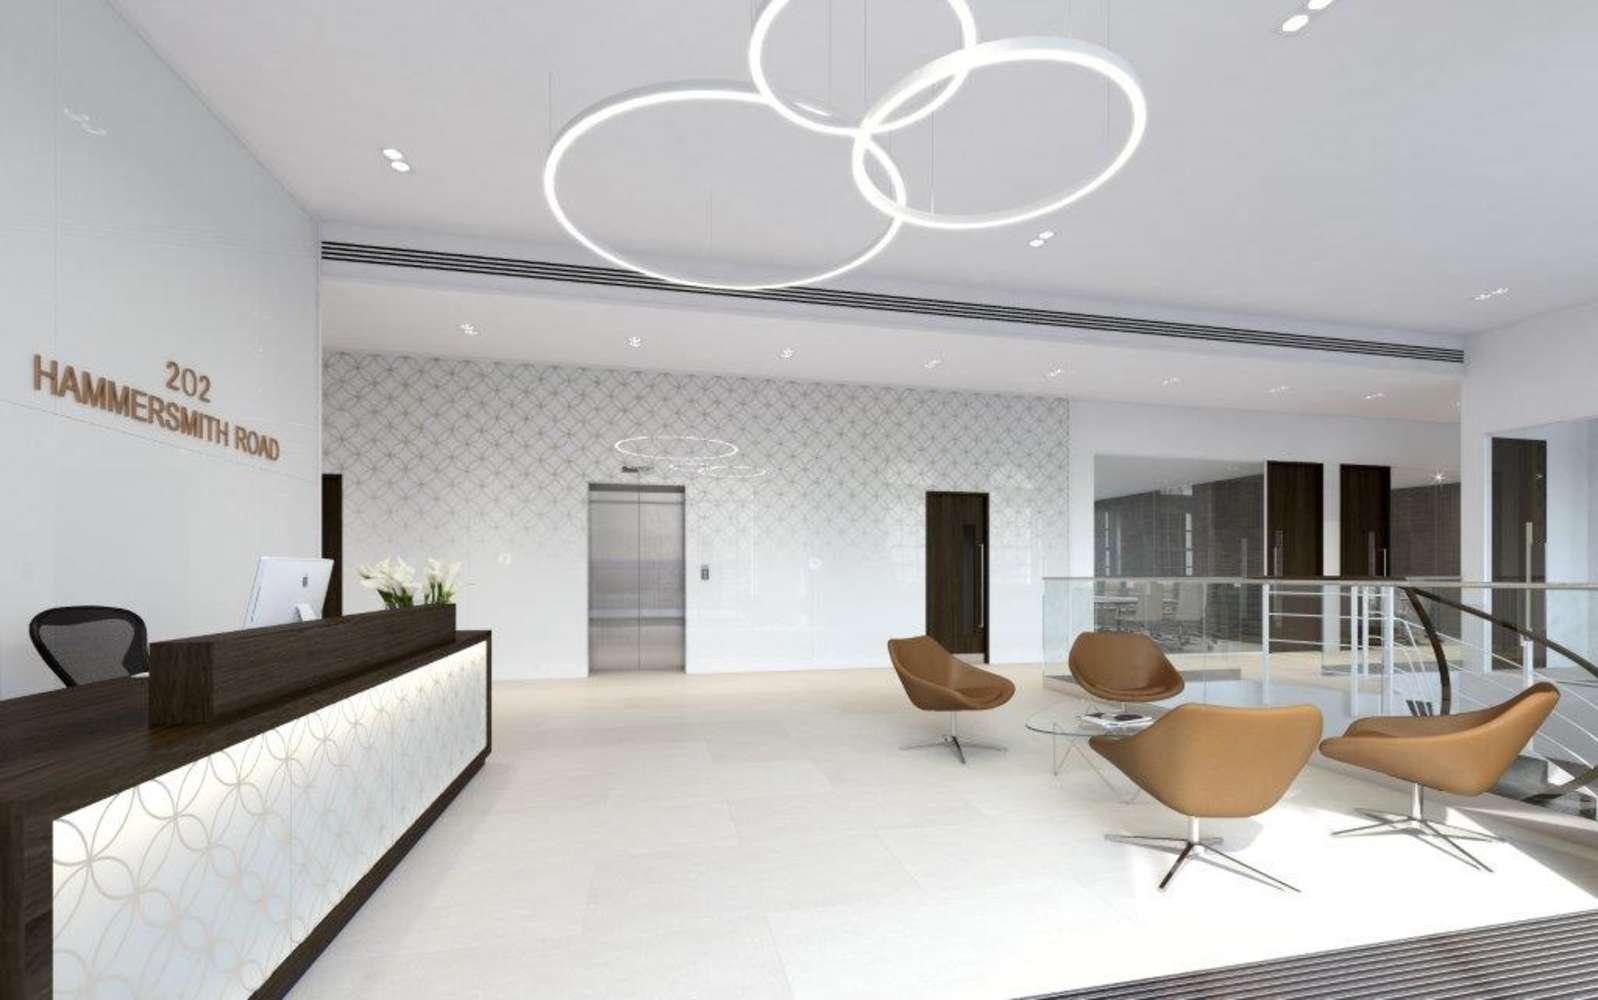 Office London, W6 7DN - 202 Hammersmith road  - 003002